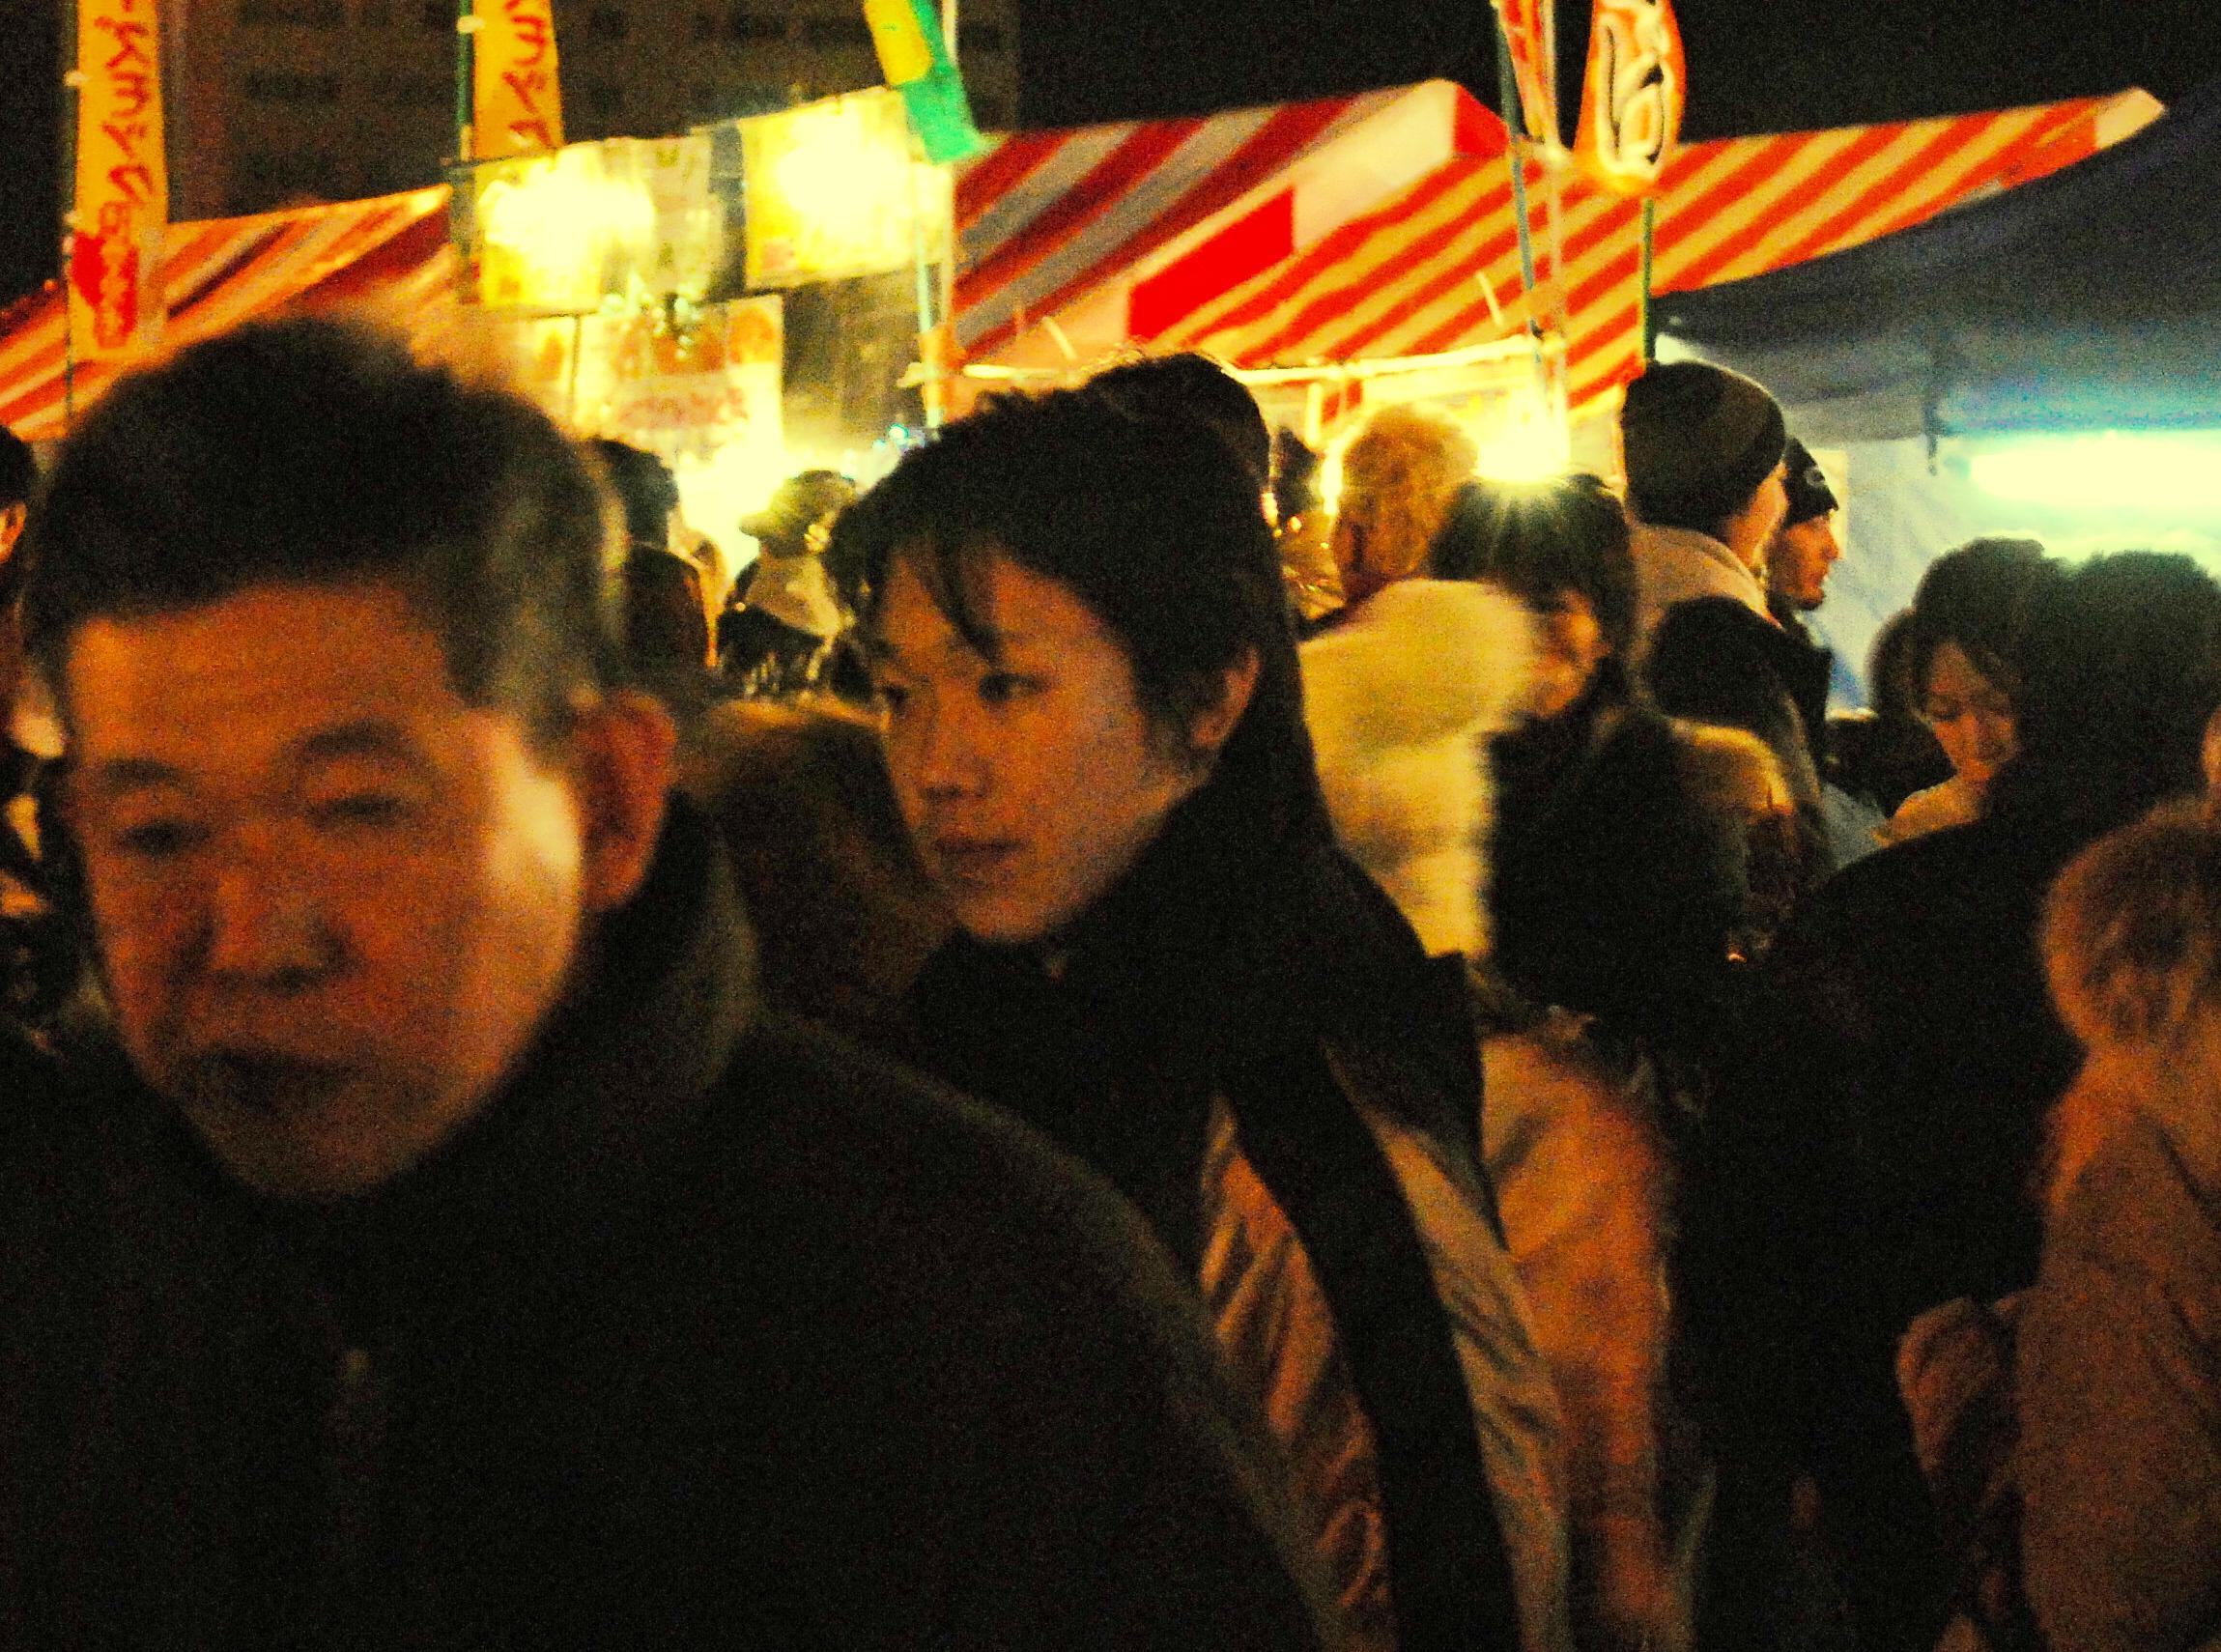 Oriental people photo